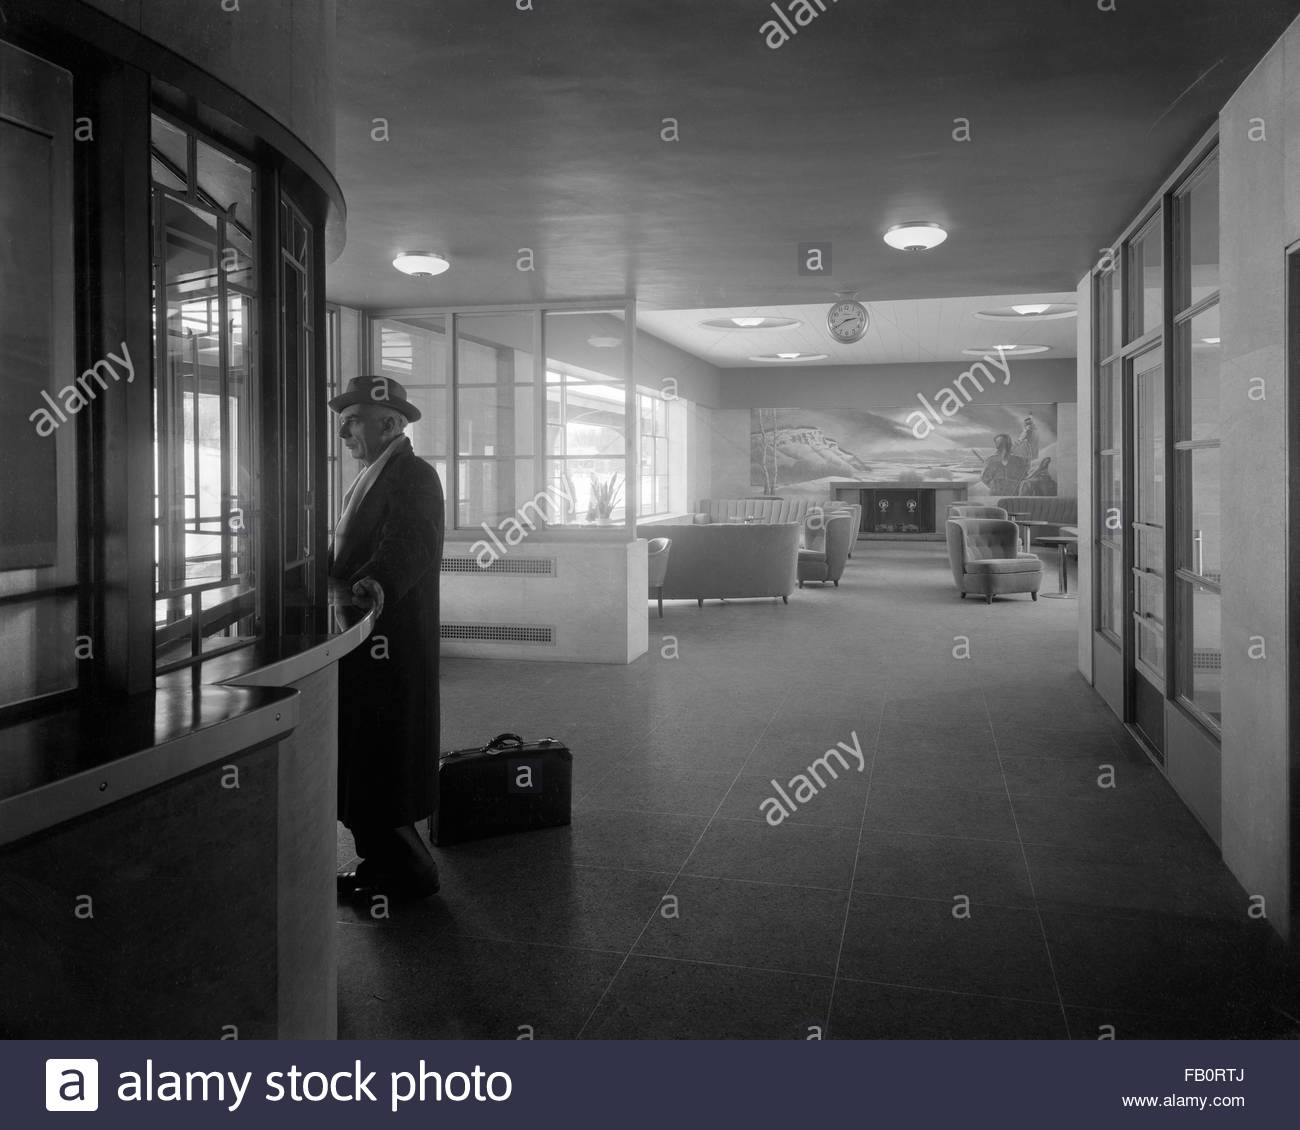 10 10 1940 Stockfotos & 10 10 1940 Bilder - Alamy